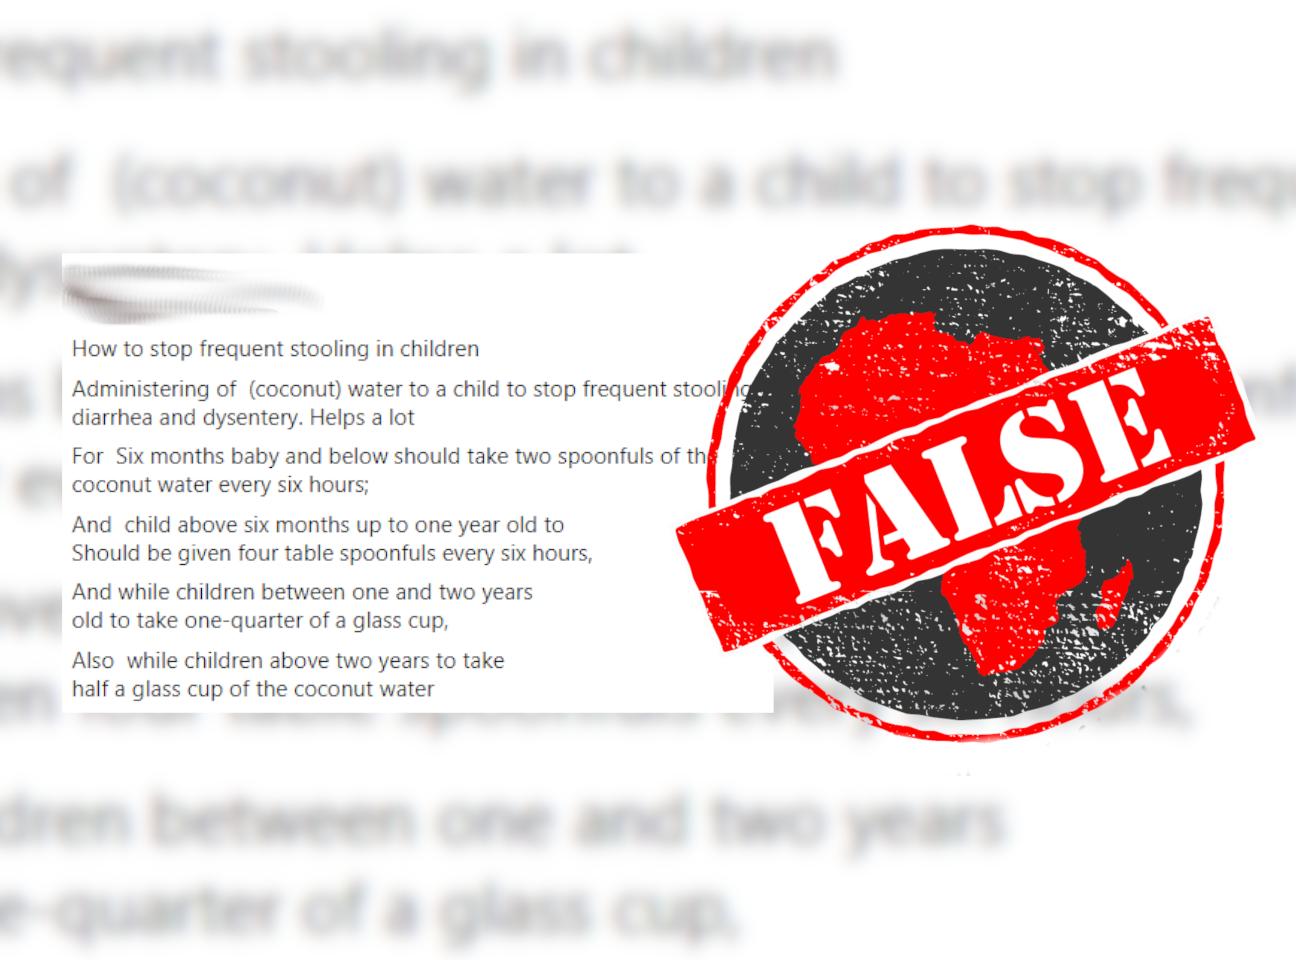 FrequentStooling_False